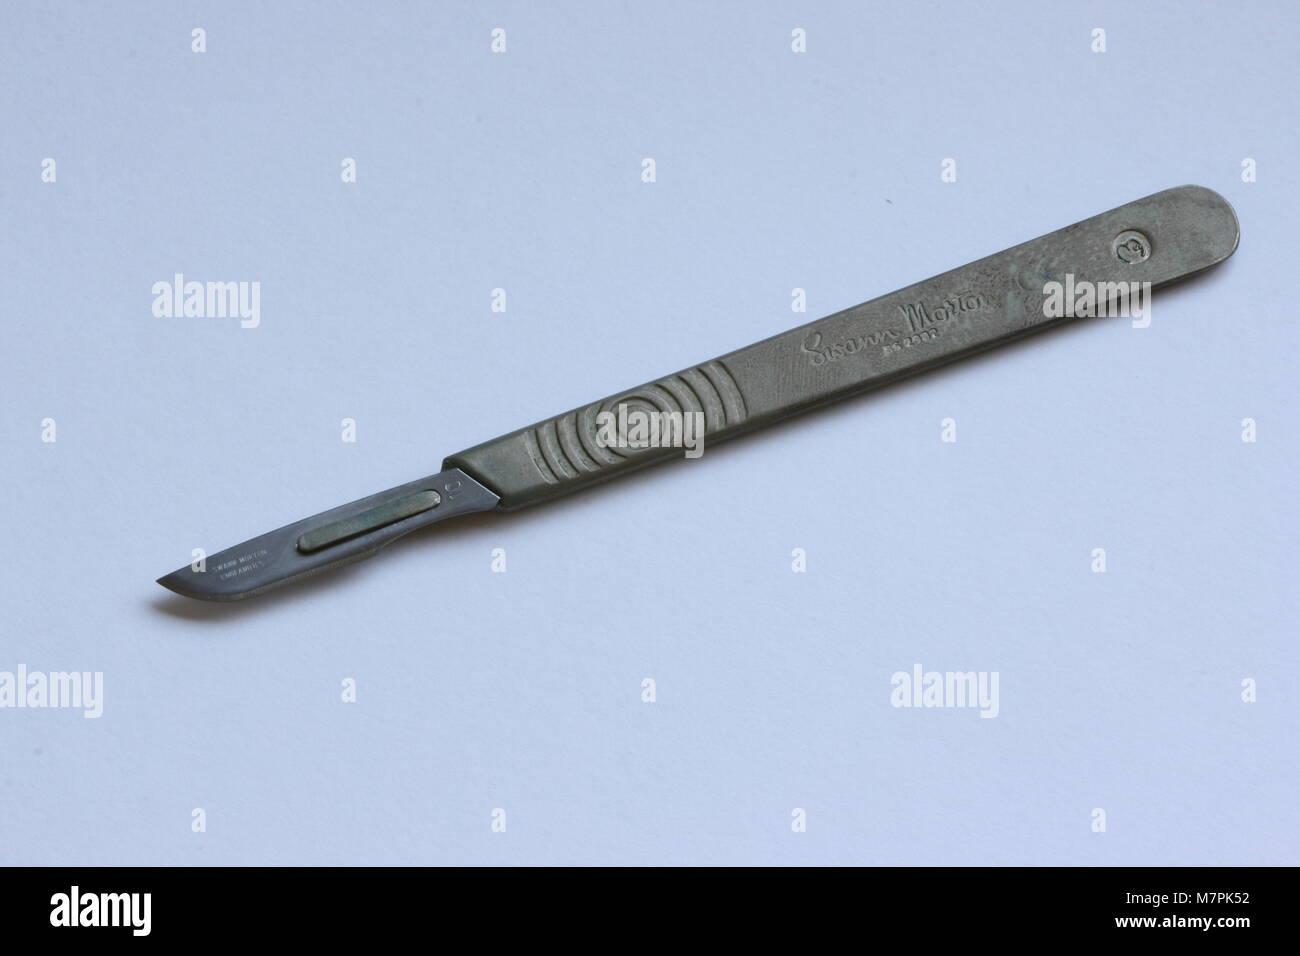 Medical Scalpel - Stock Image